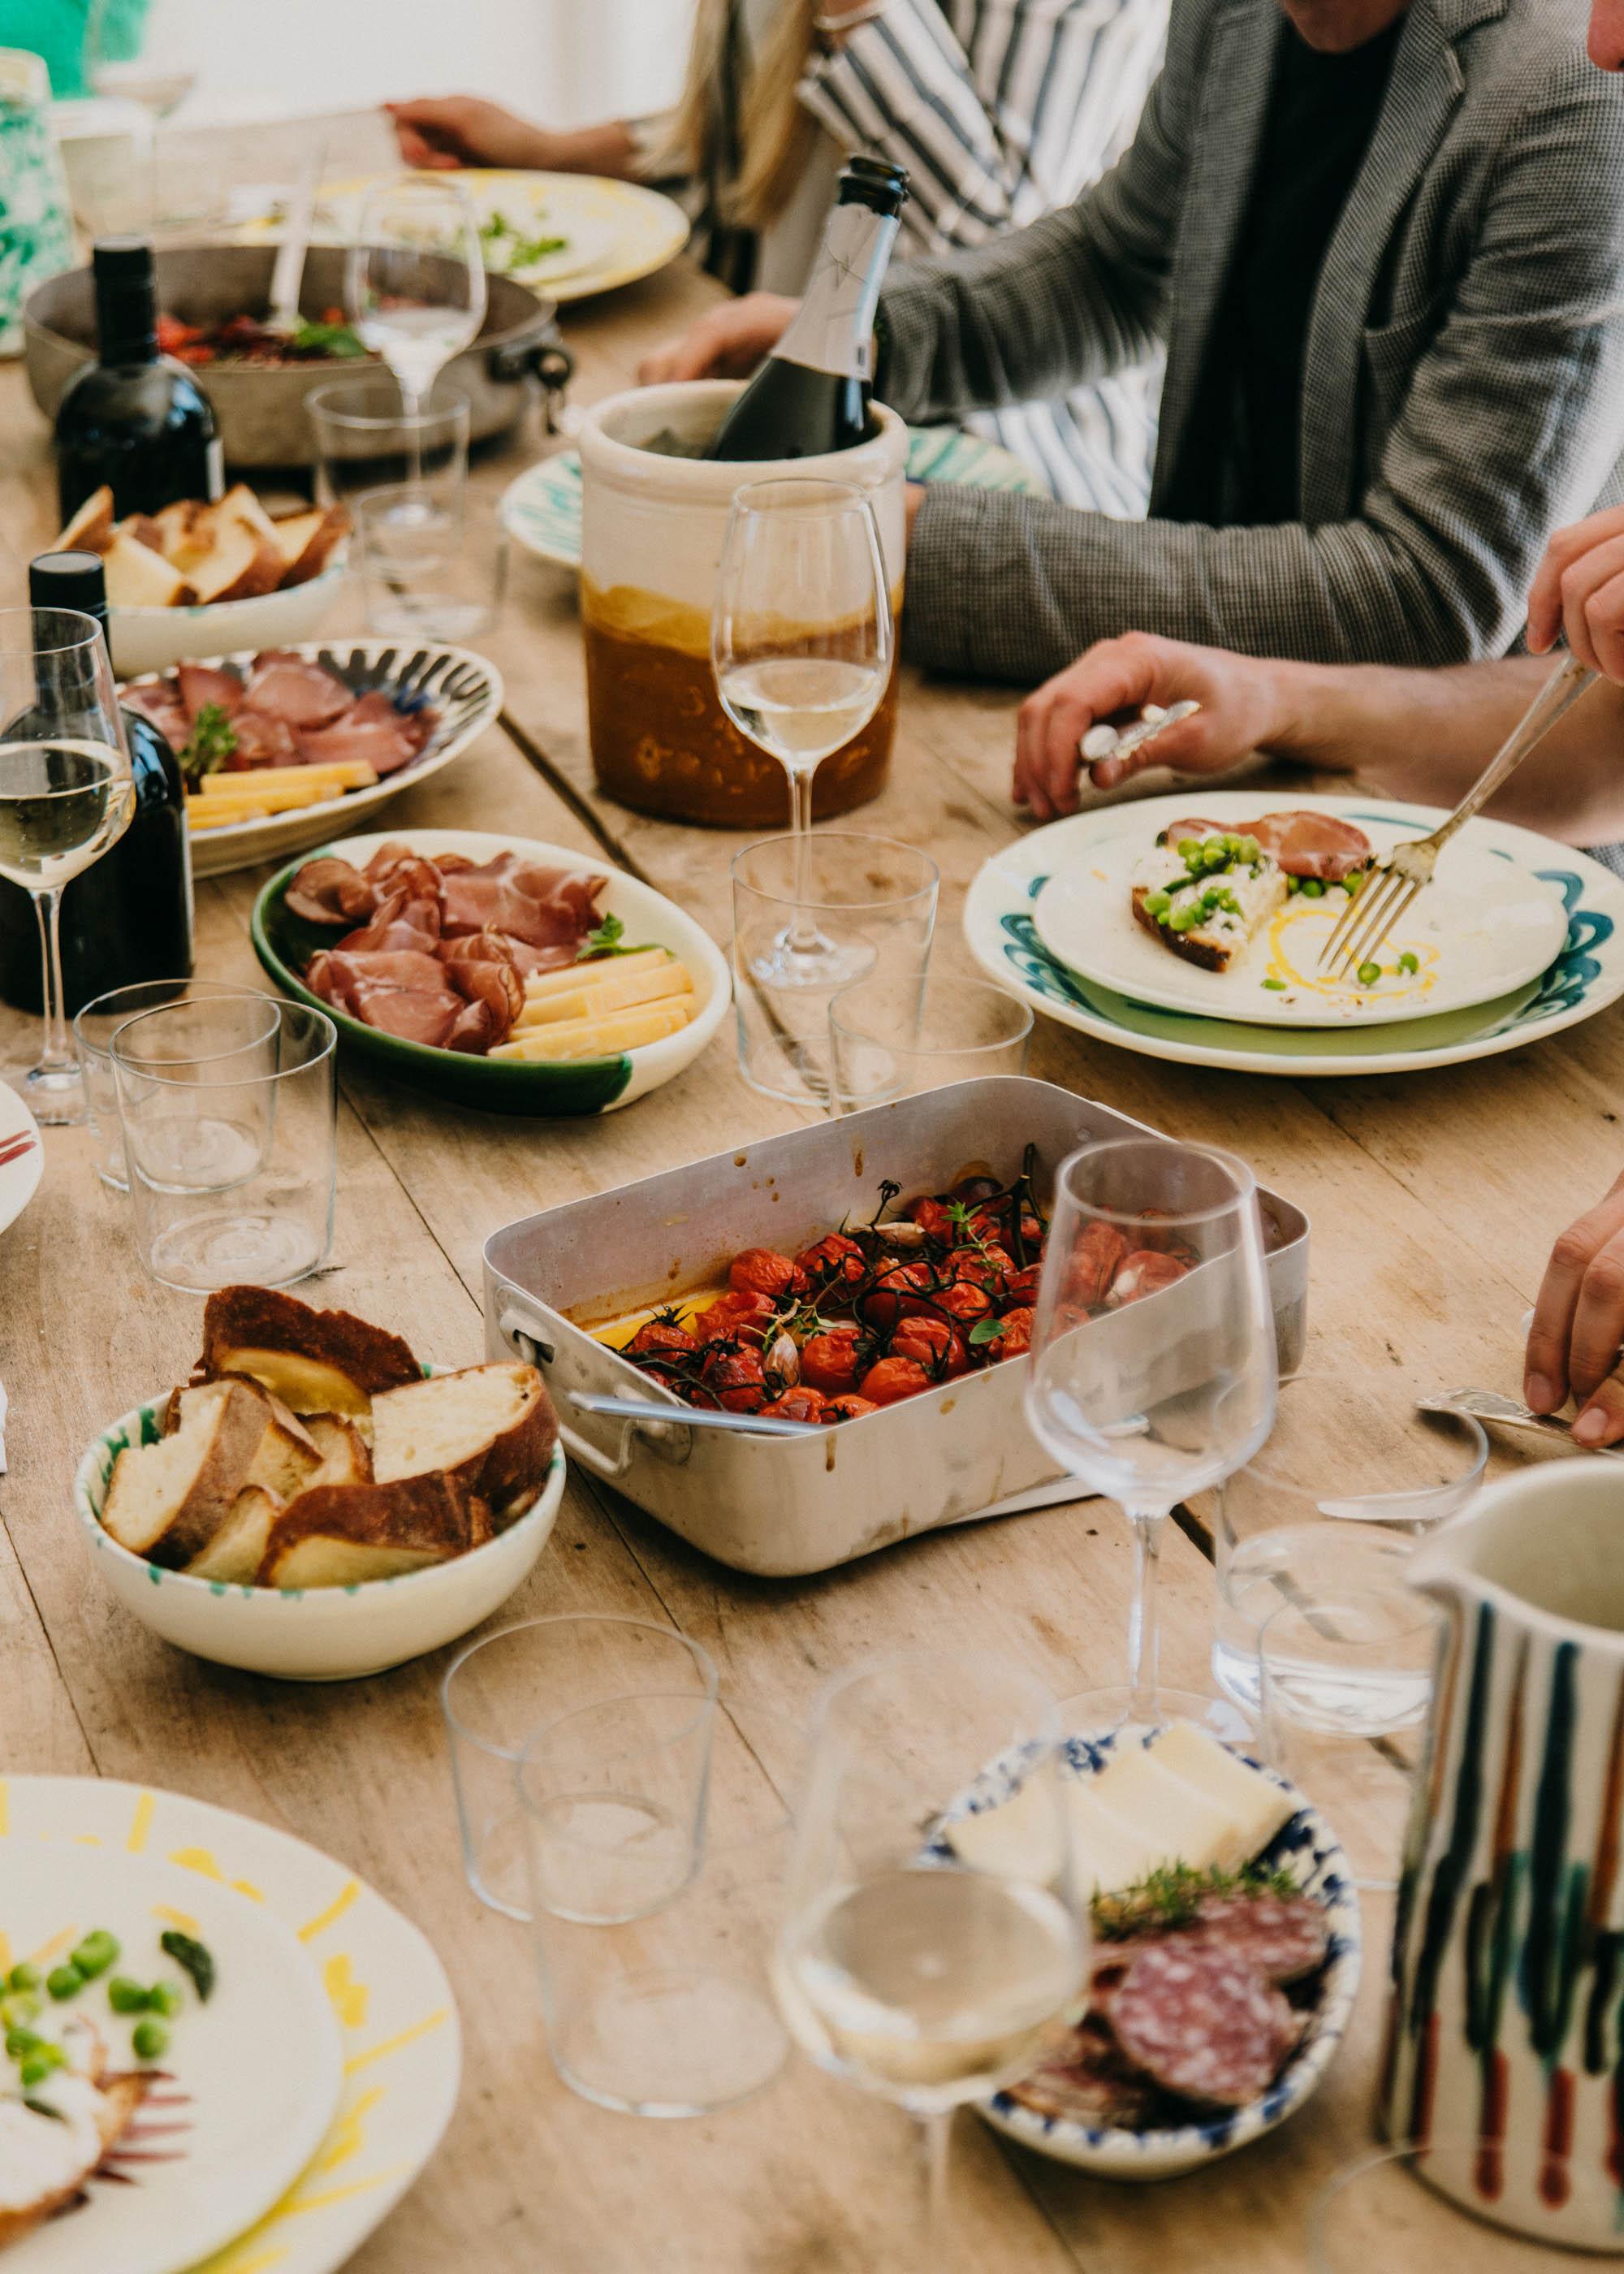 #italy #puglia #masseria #morosseta #hotels #openhouse #food #gnambox #lifestyle